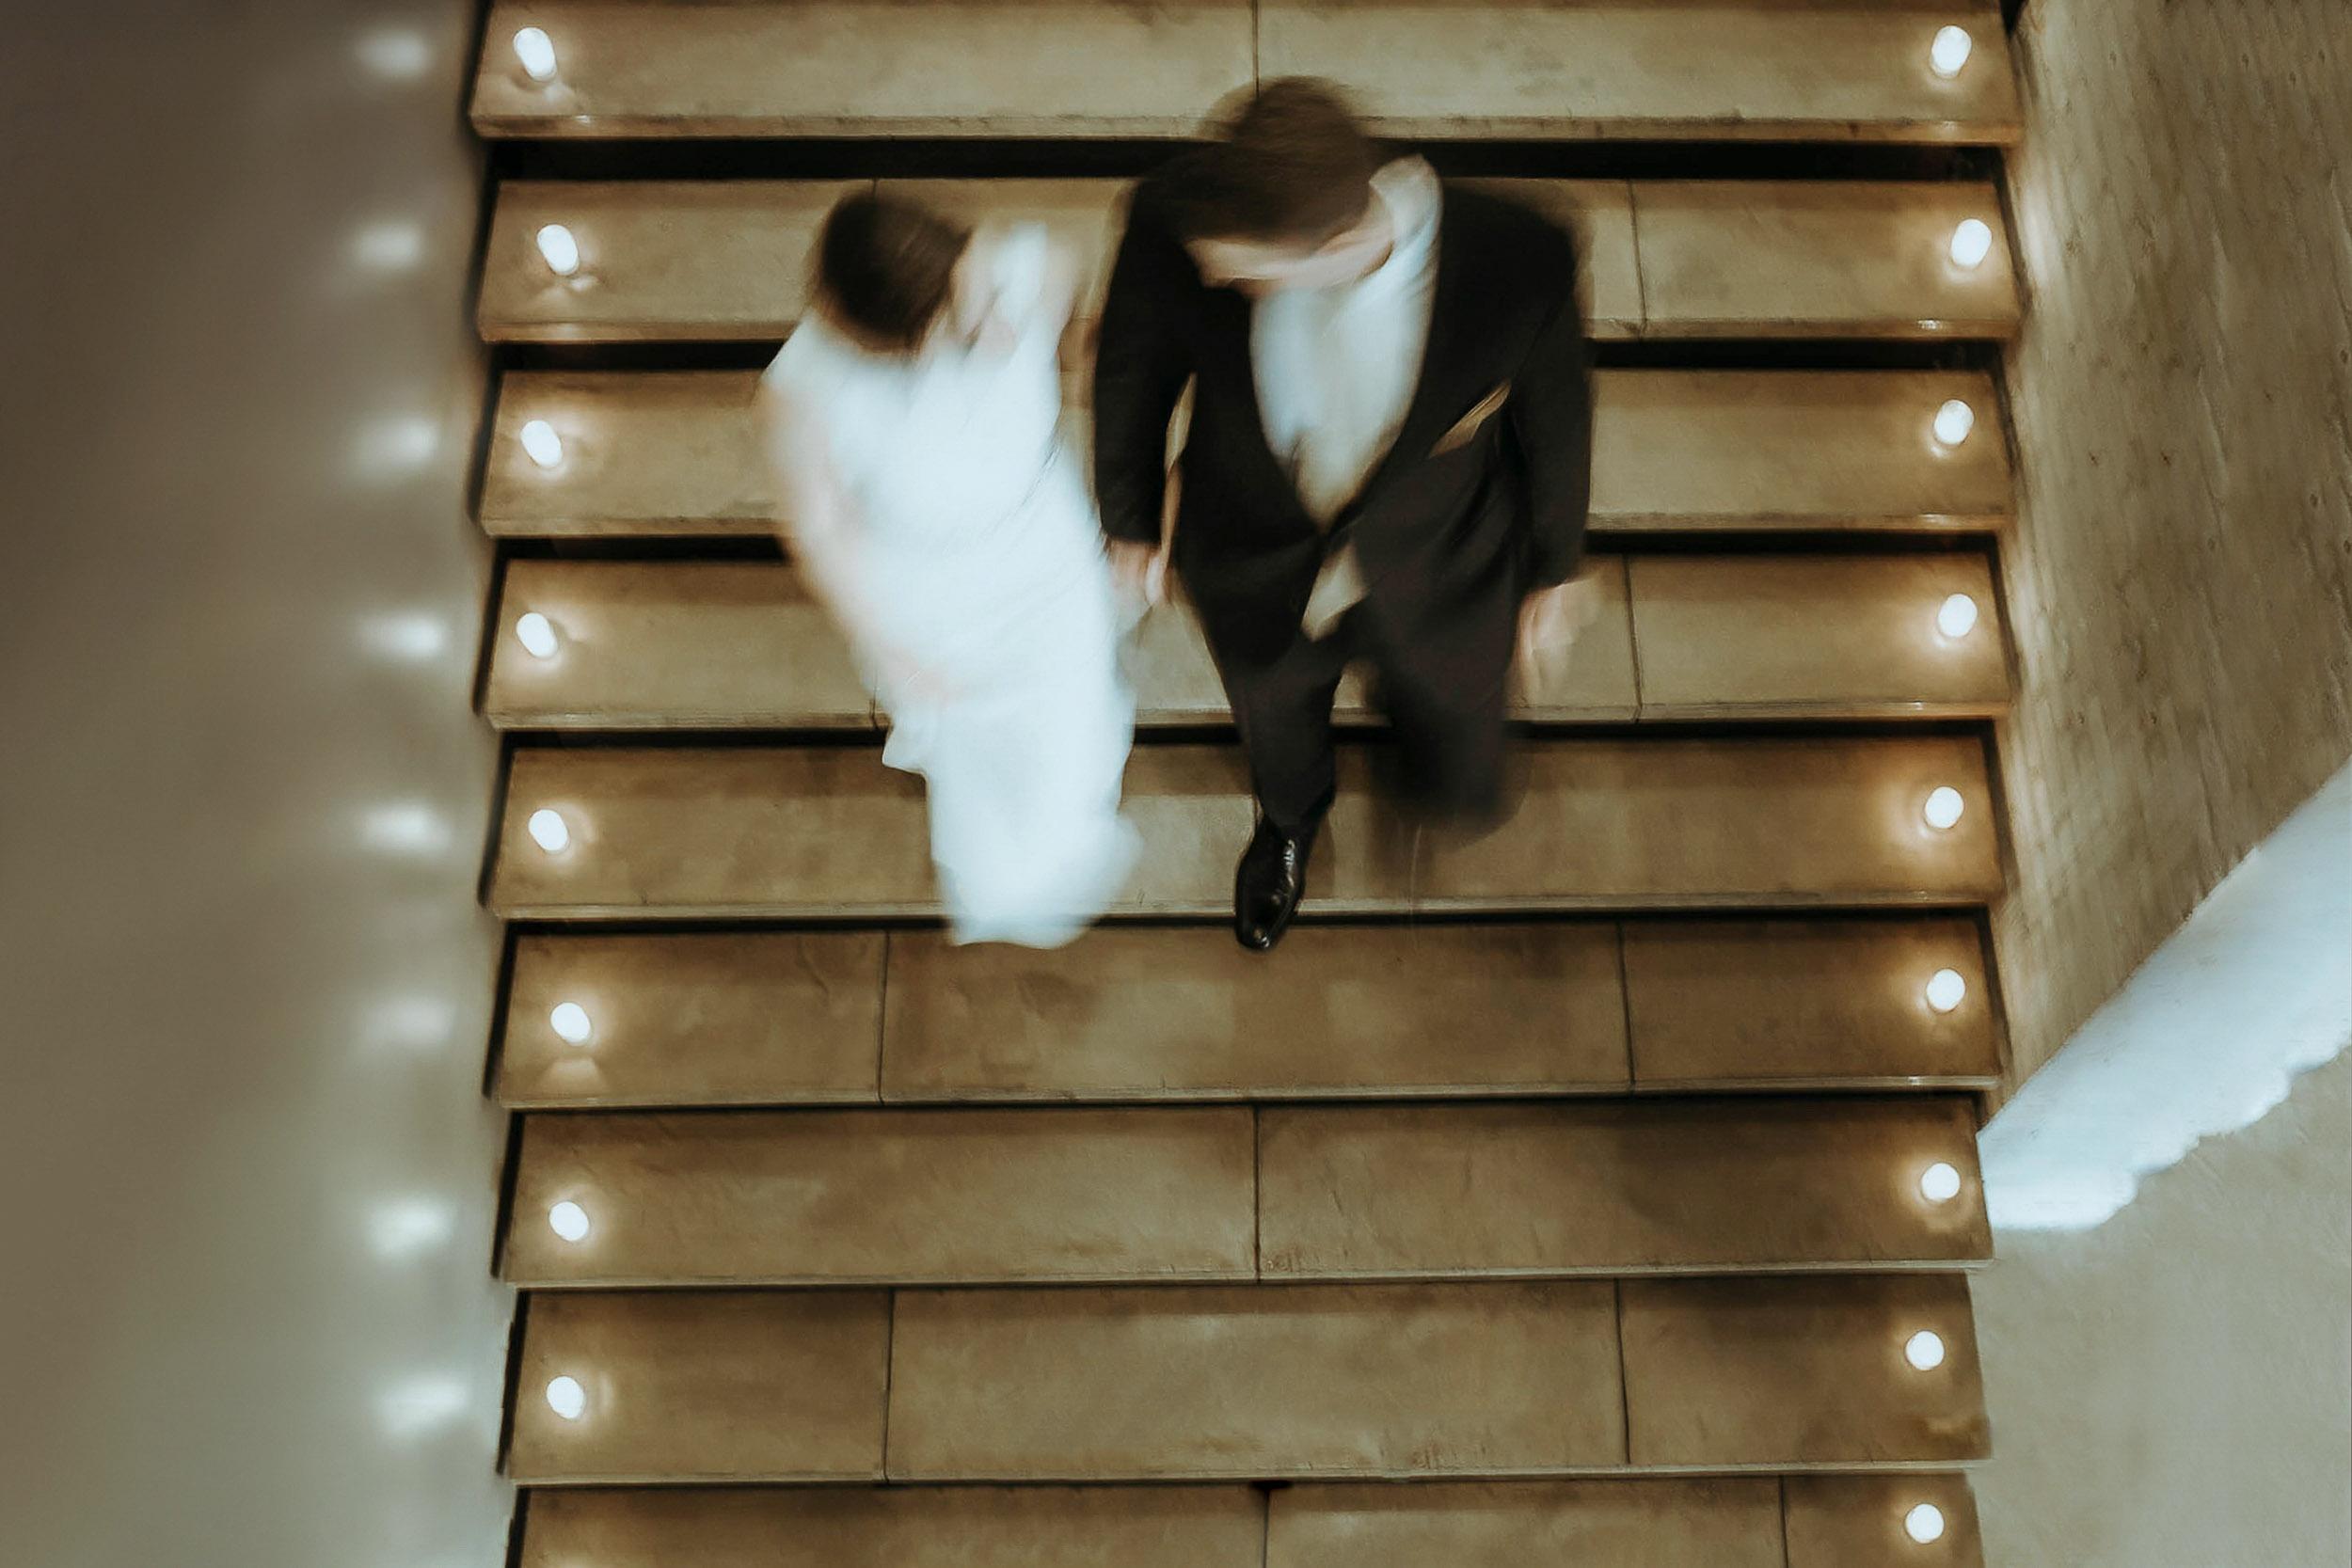 80-five event center minneapolis wedding photographer-1.jpg